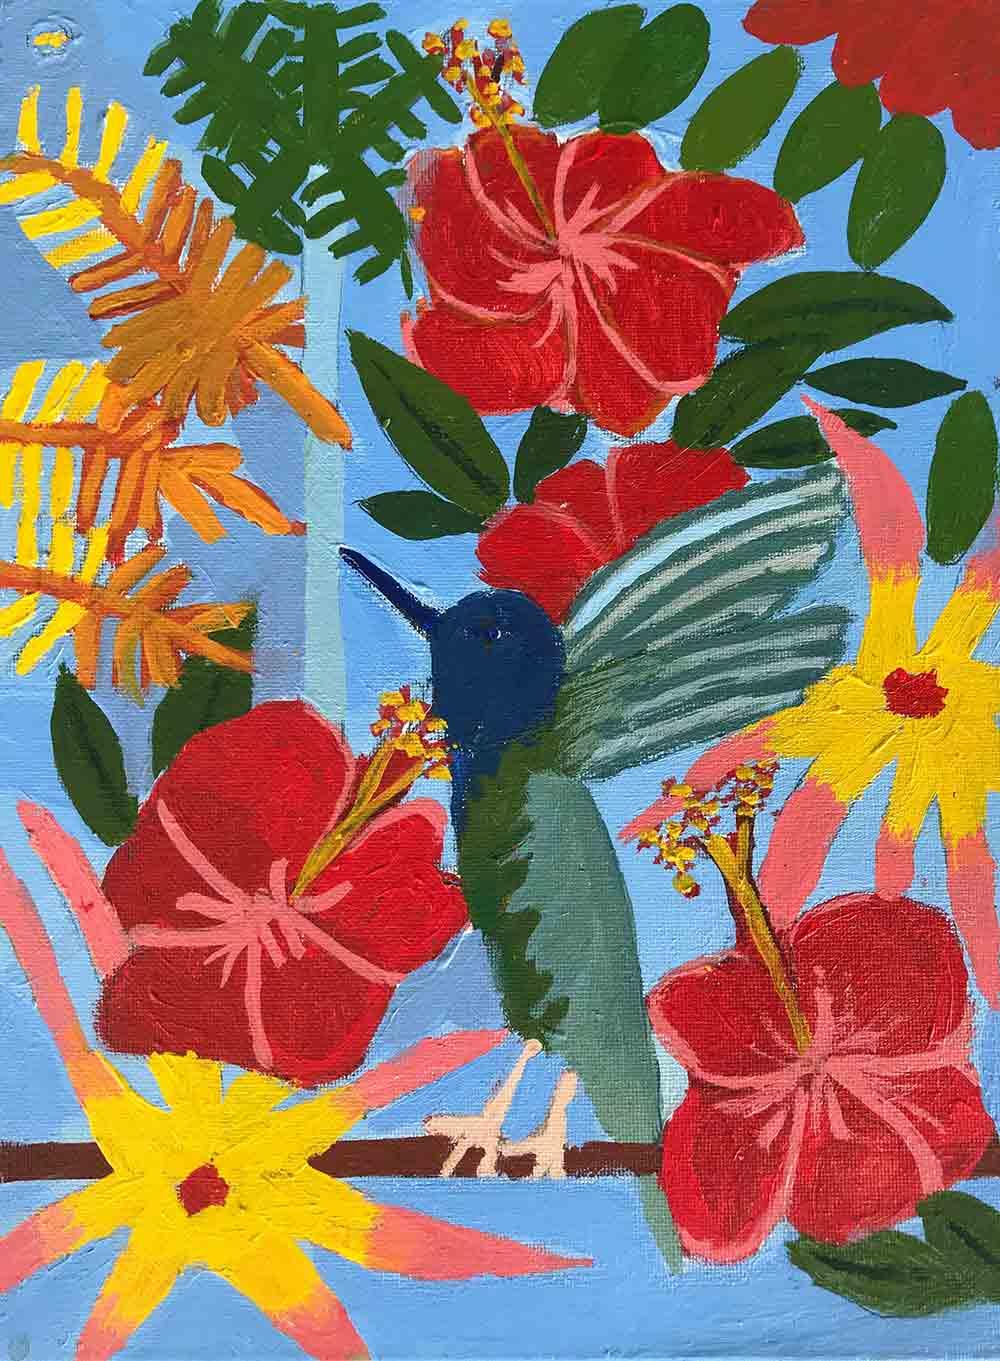 Exhibitions Hummingbird Acrylic on Canvas Zion Levy Stewart Art with Heart Mullumbimby